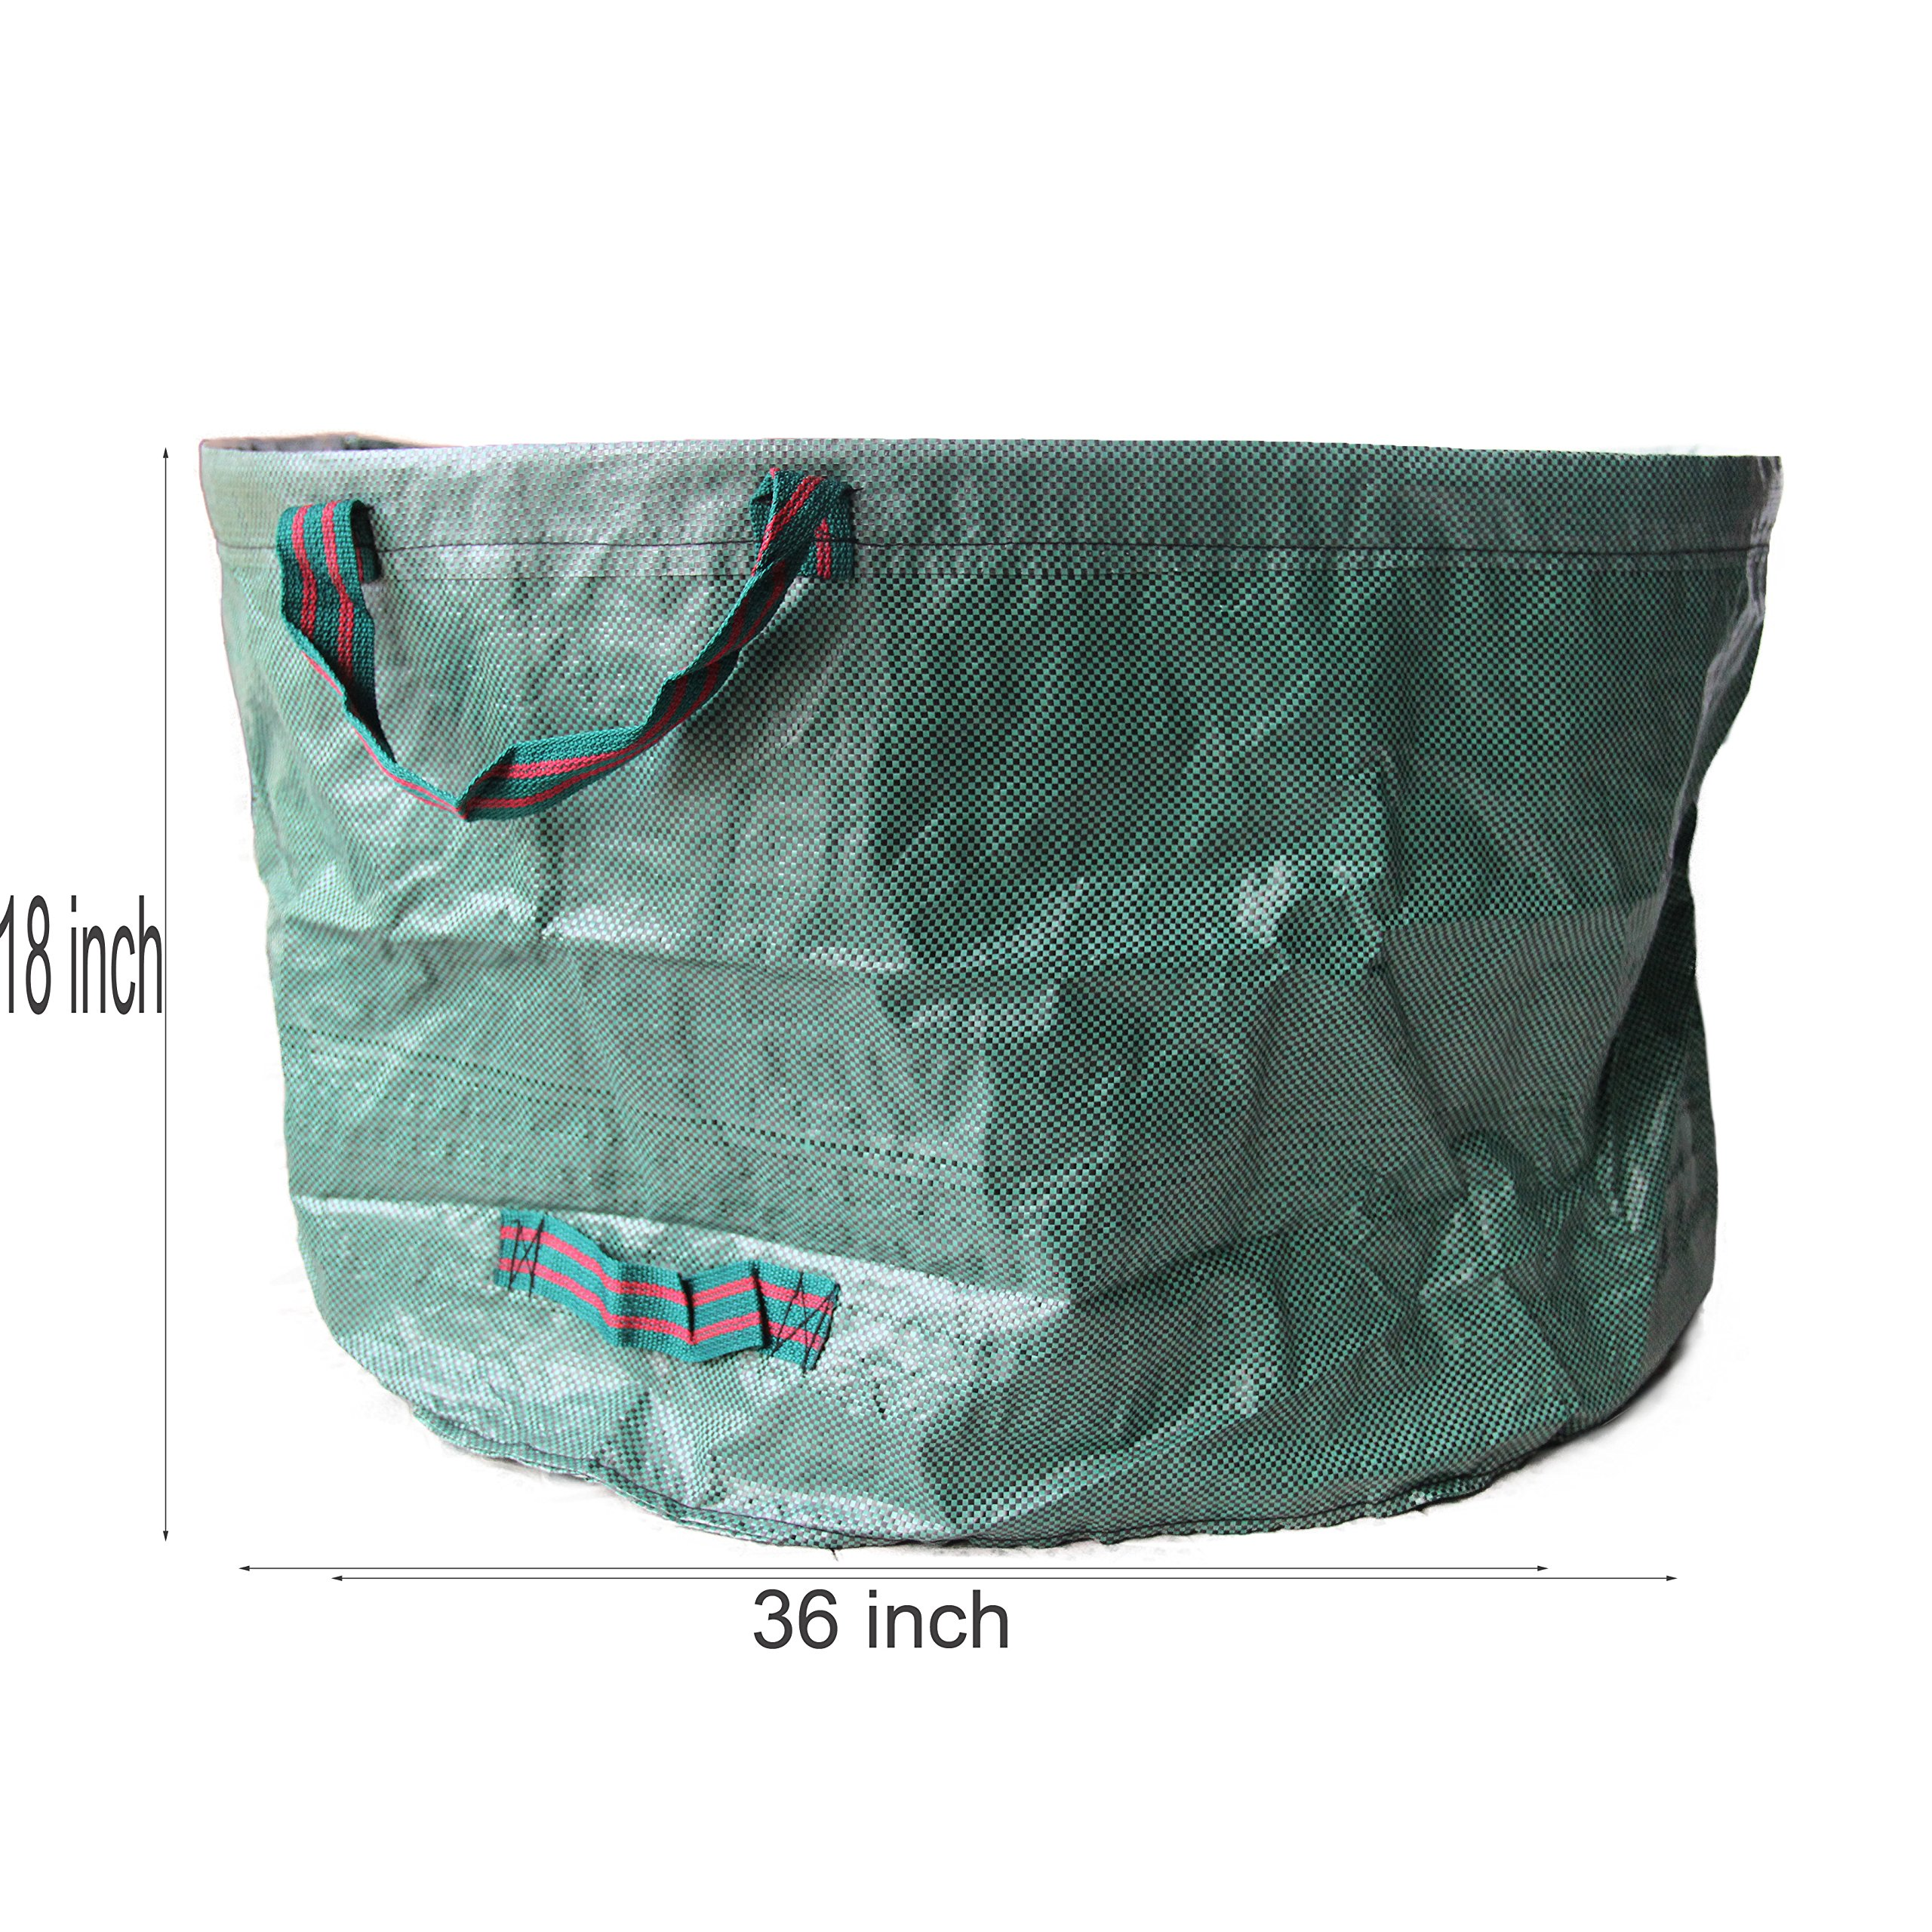 SUNWIN Lawn and Leaf Bags Garden Reusable Leaf Bag Yard Lawn Gardening Waste Bag 63 Gallons by Sunwin (Image #2)